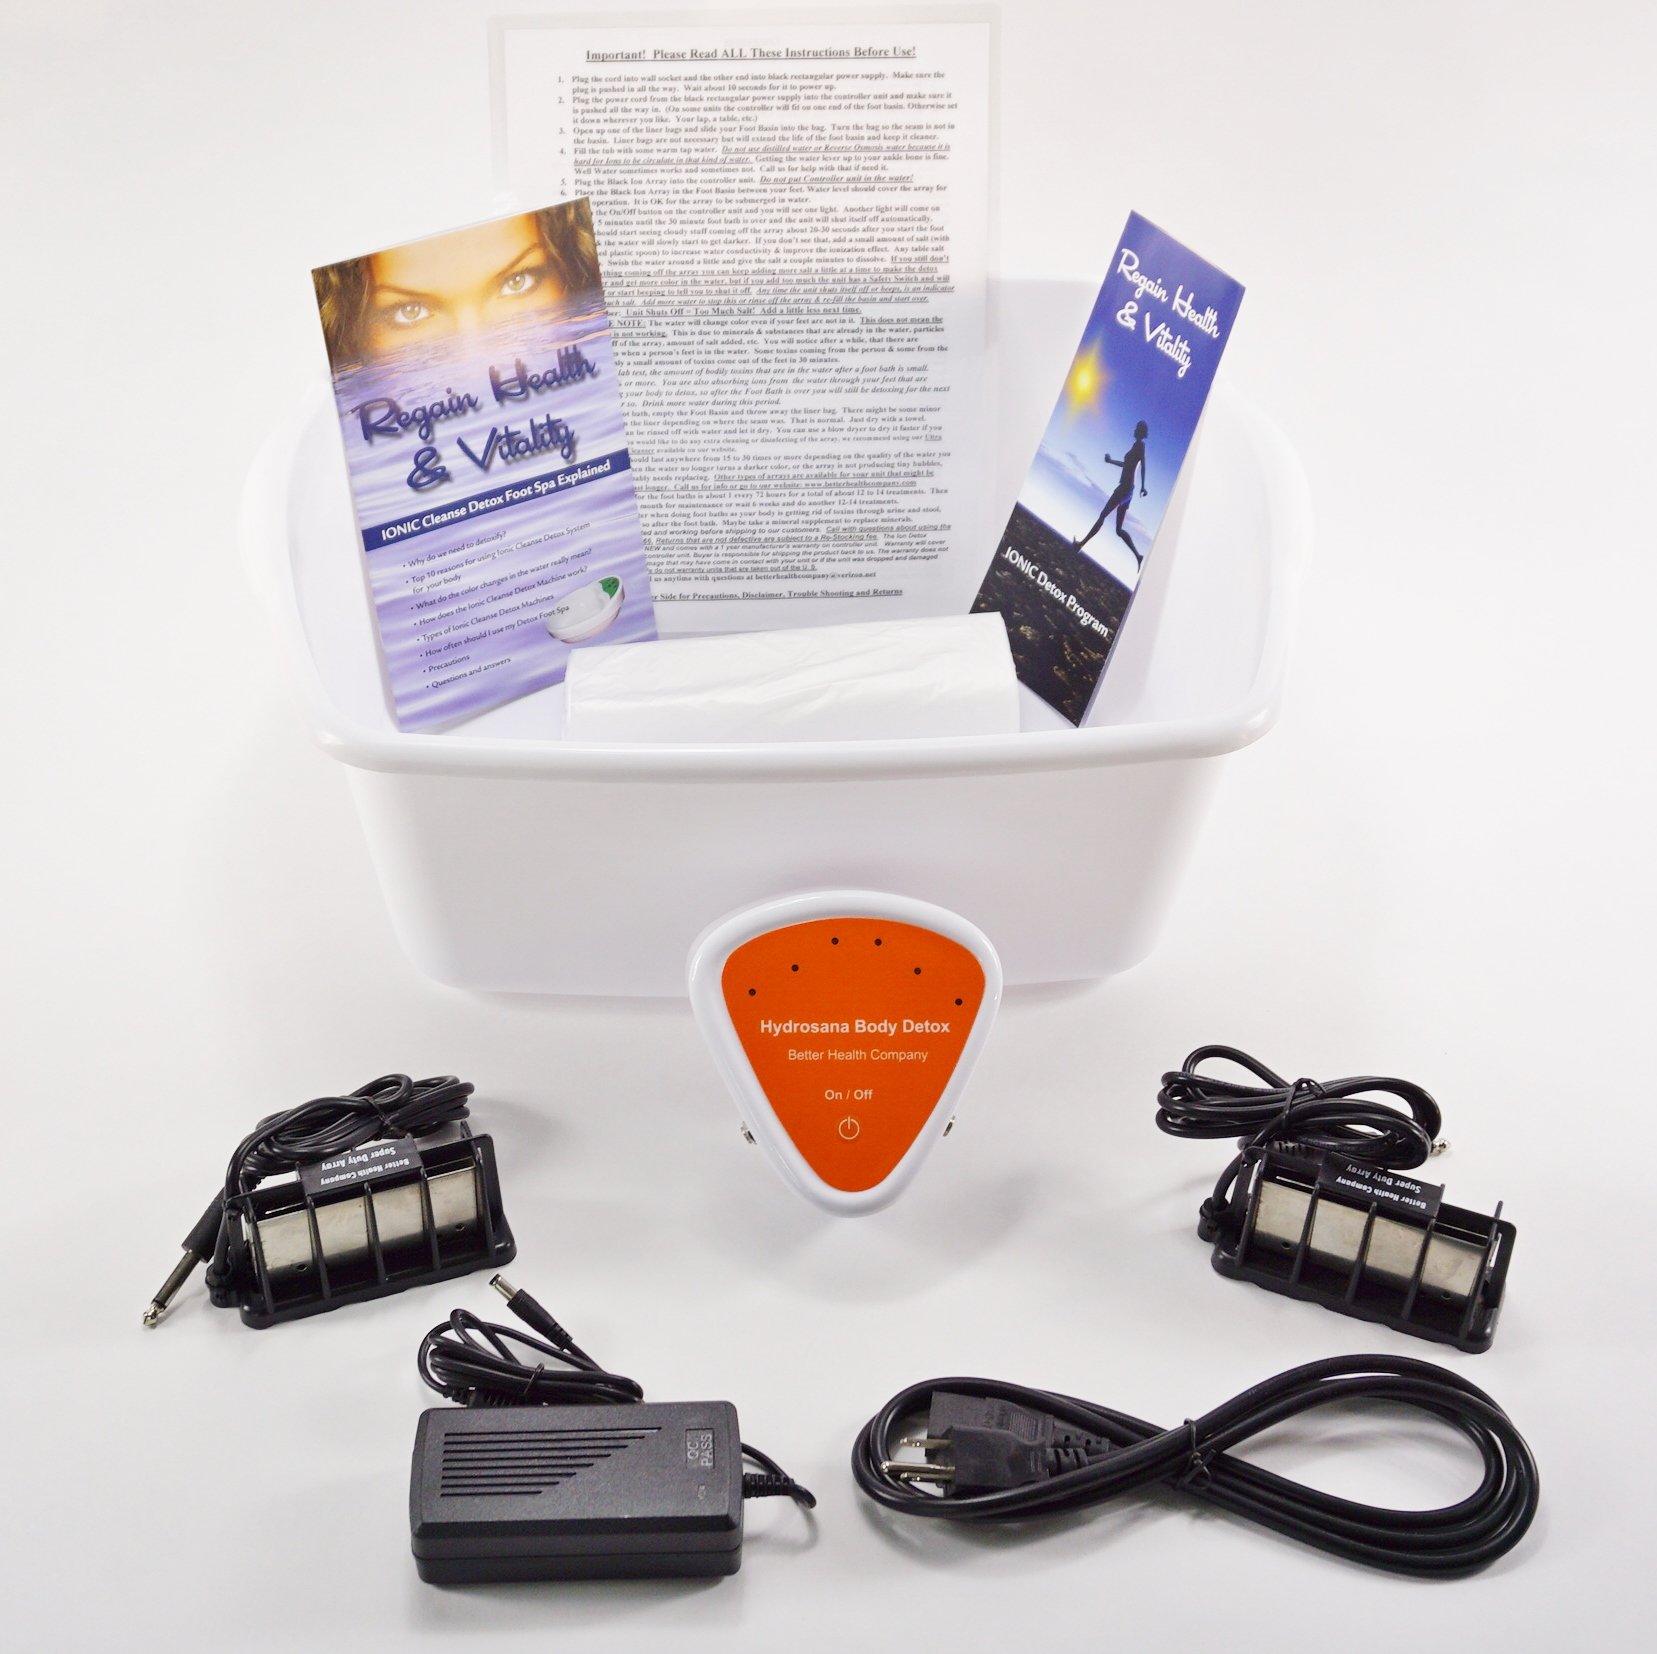 Buy Foot Spa - Ionic Foot Cleanse - Foot Spa Bath. Detox Foot Spa ...